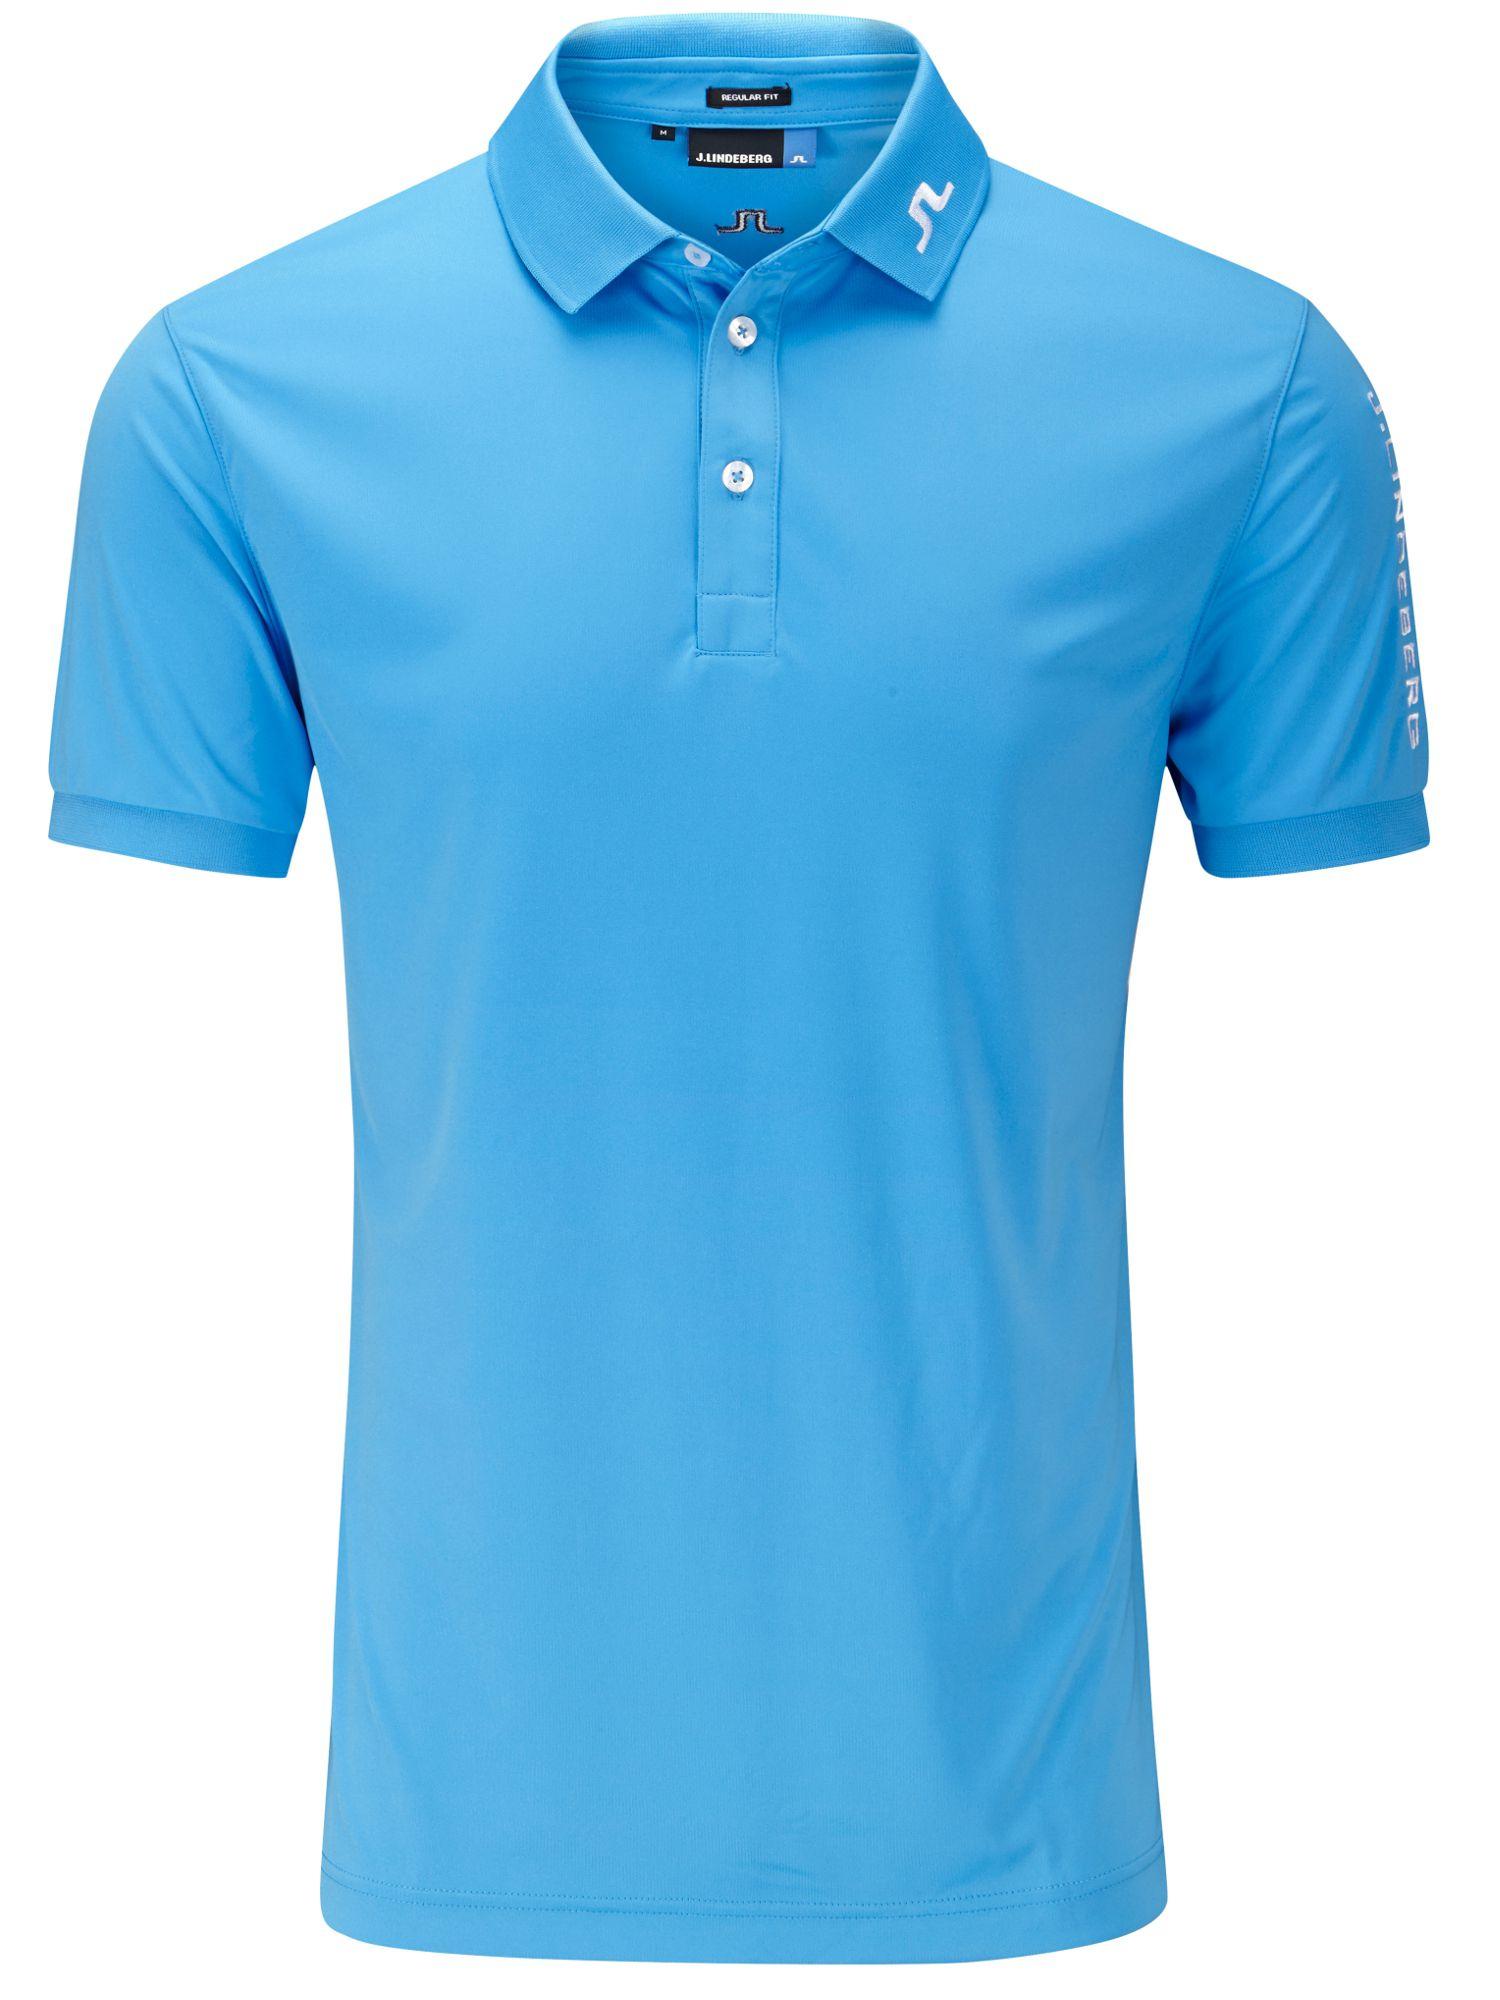 Tour Tech Tx Polo Shirt In Blue For Men Lyst